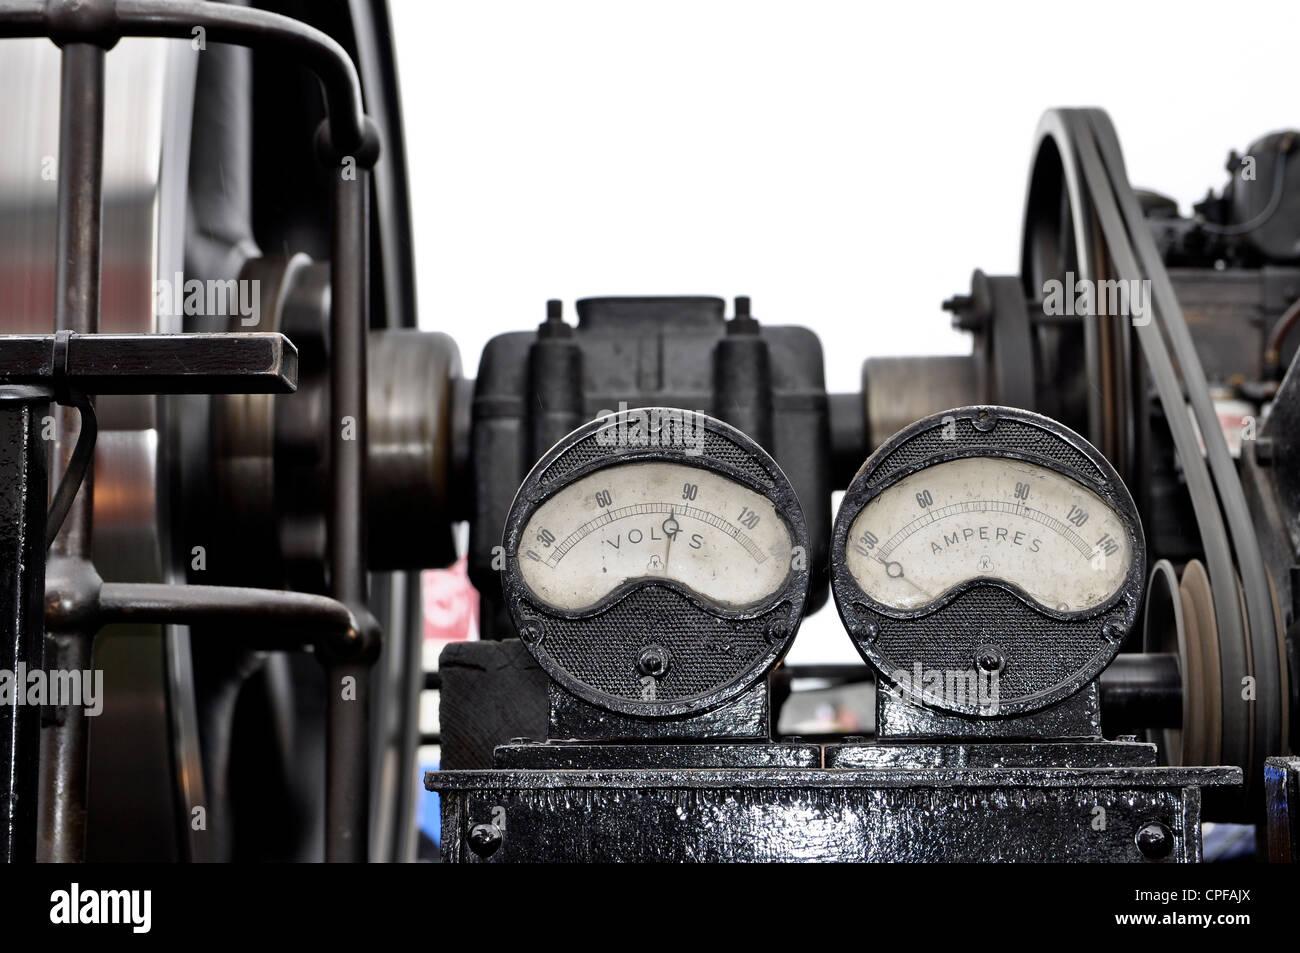 1926 Ruston engine - Stock Image